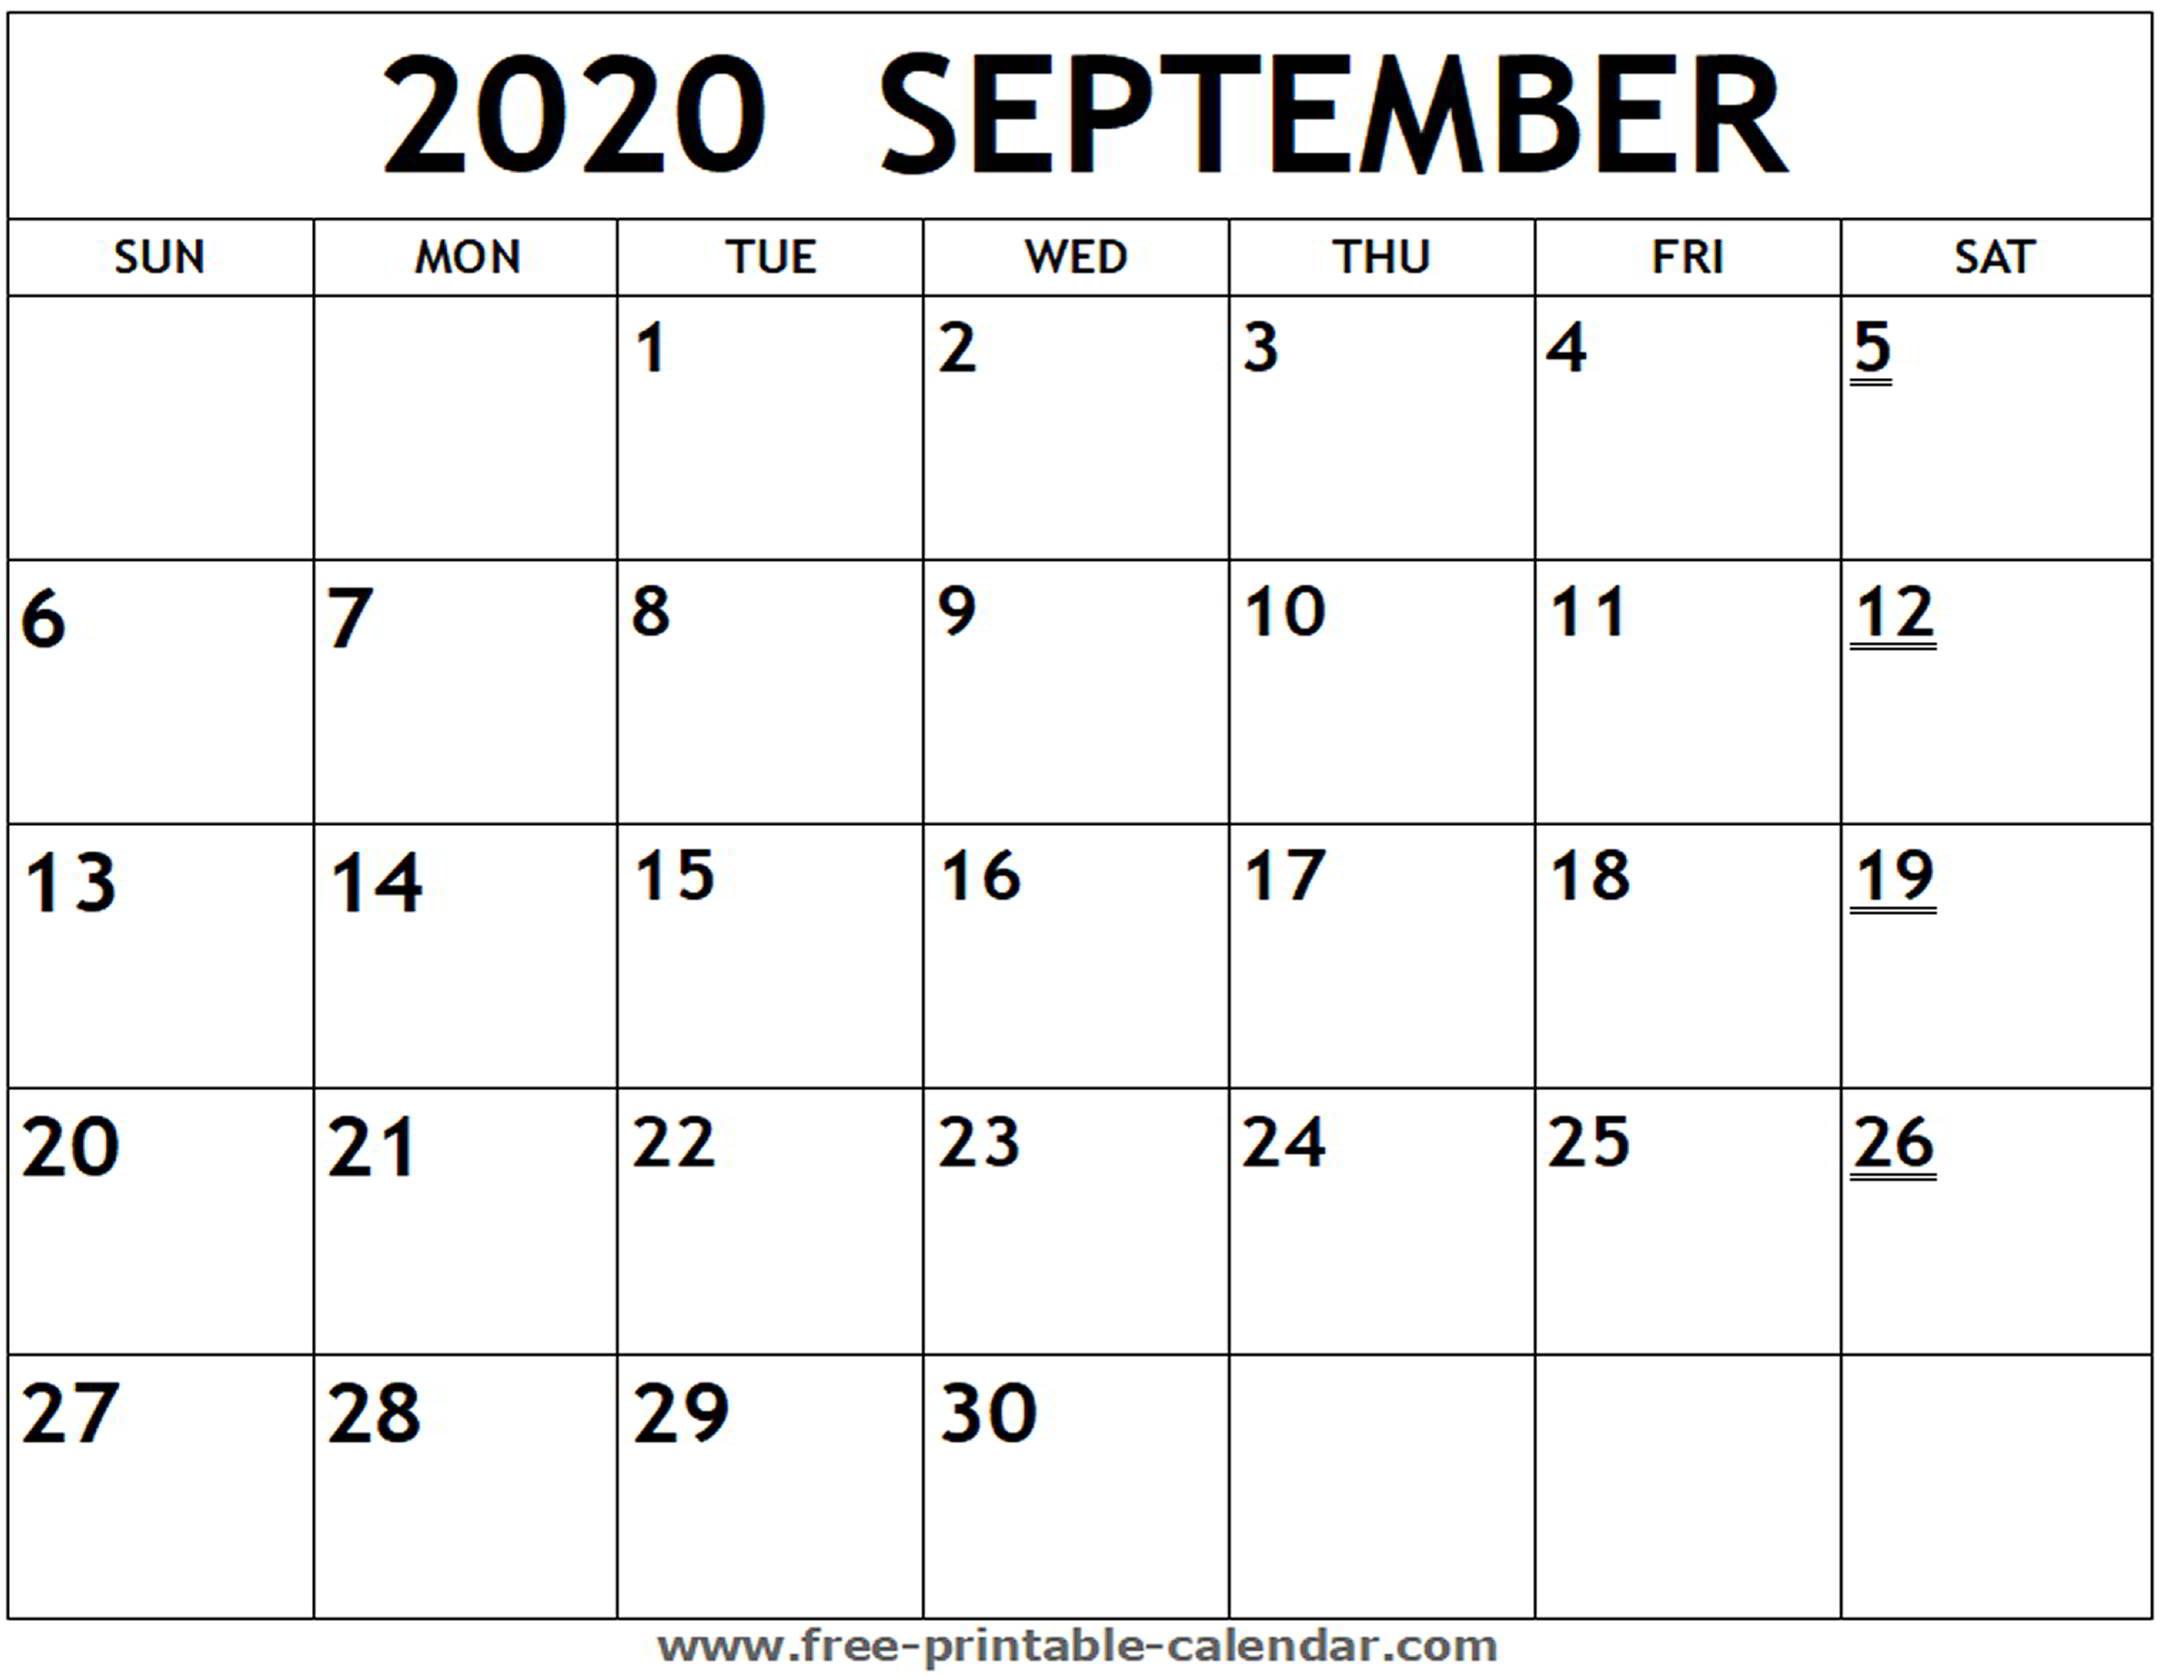 Printable 2020 September Calendar - Free-Printable-Calendar for September Fill In Calendar 2020